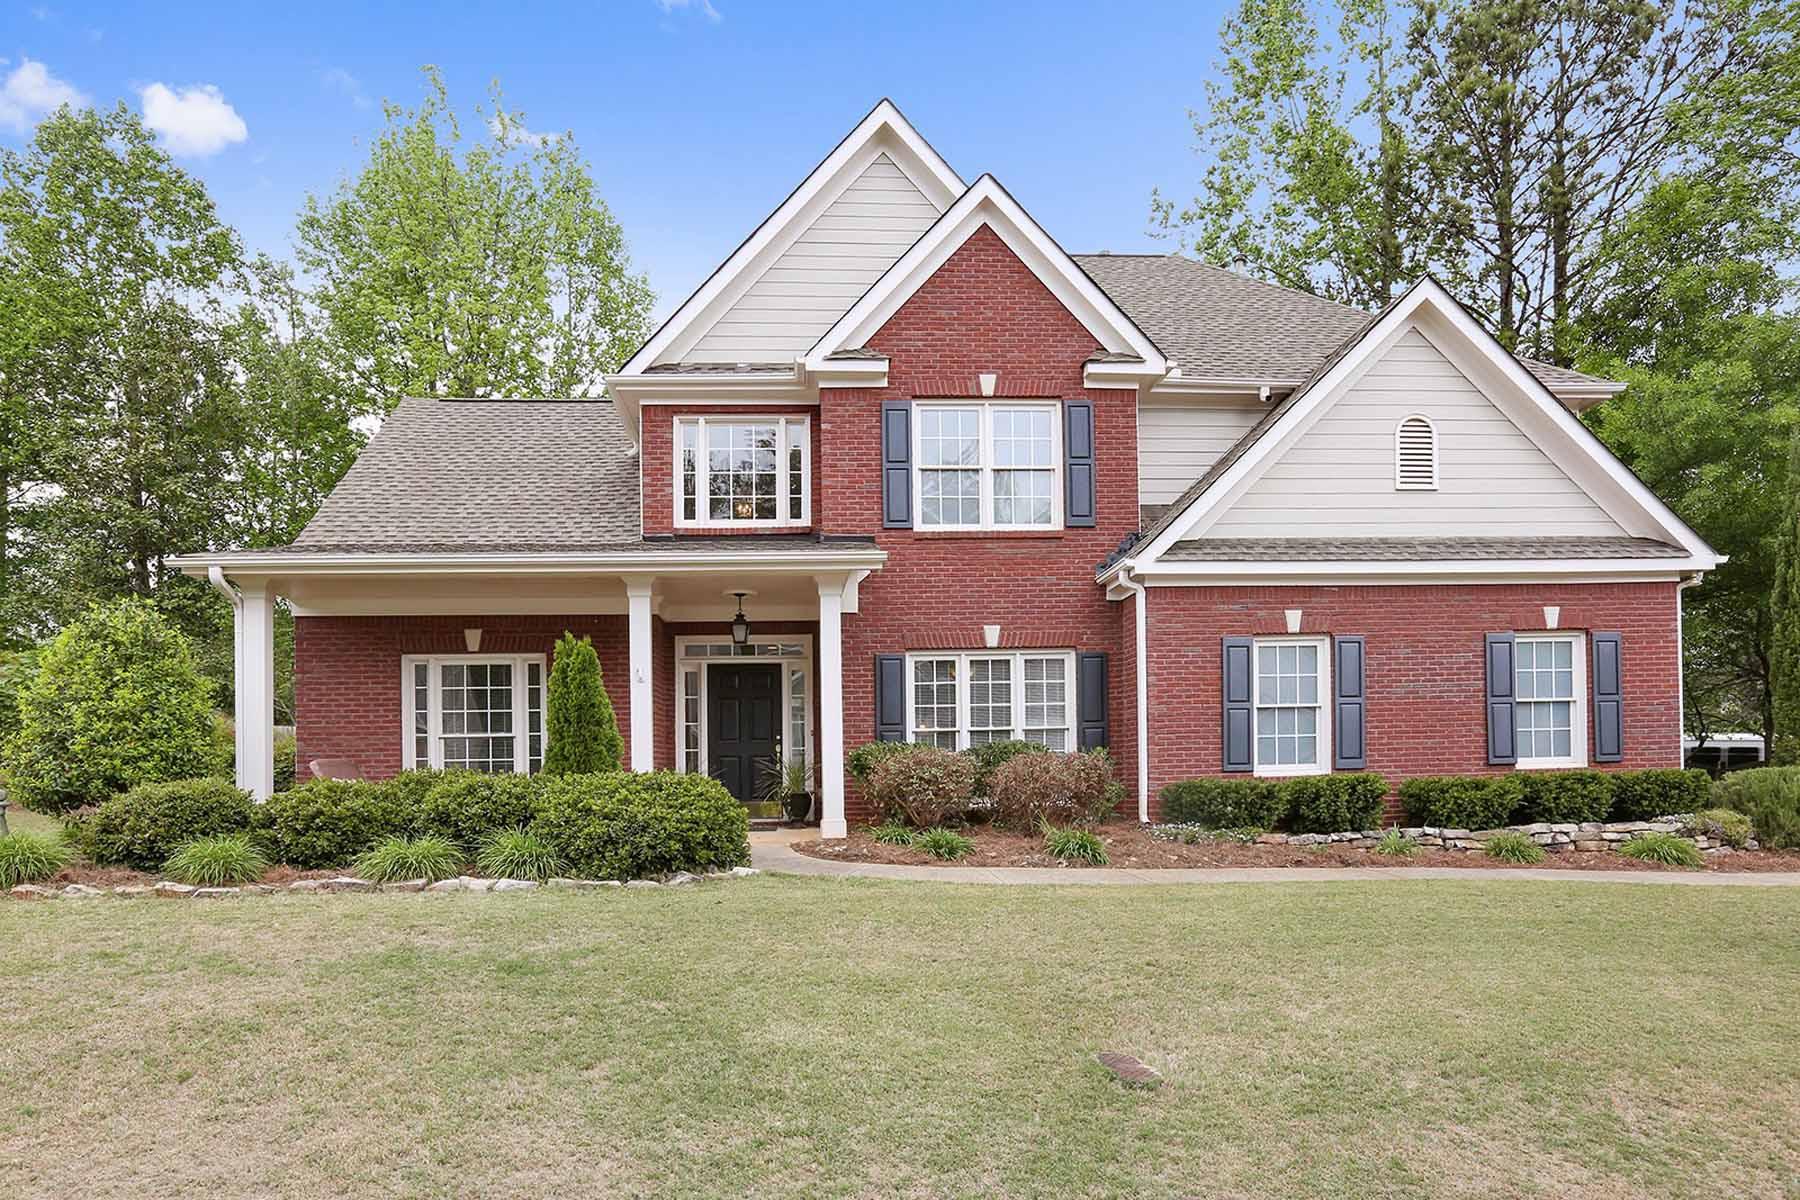 Casa Unifamiliar por un Venta en Beauty, Convenience & Variety- Welcome Home! 540 Parkbrook Trace Alpharetta, Georgia, 30004 Estados Unidos